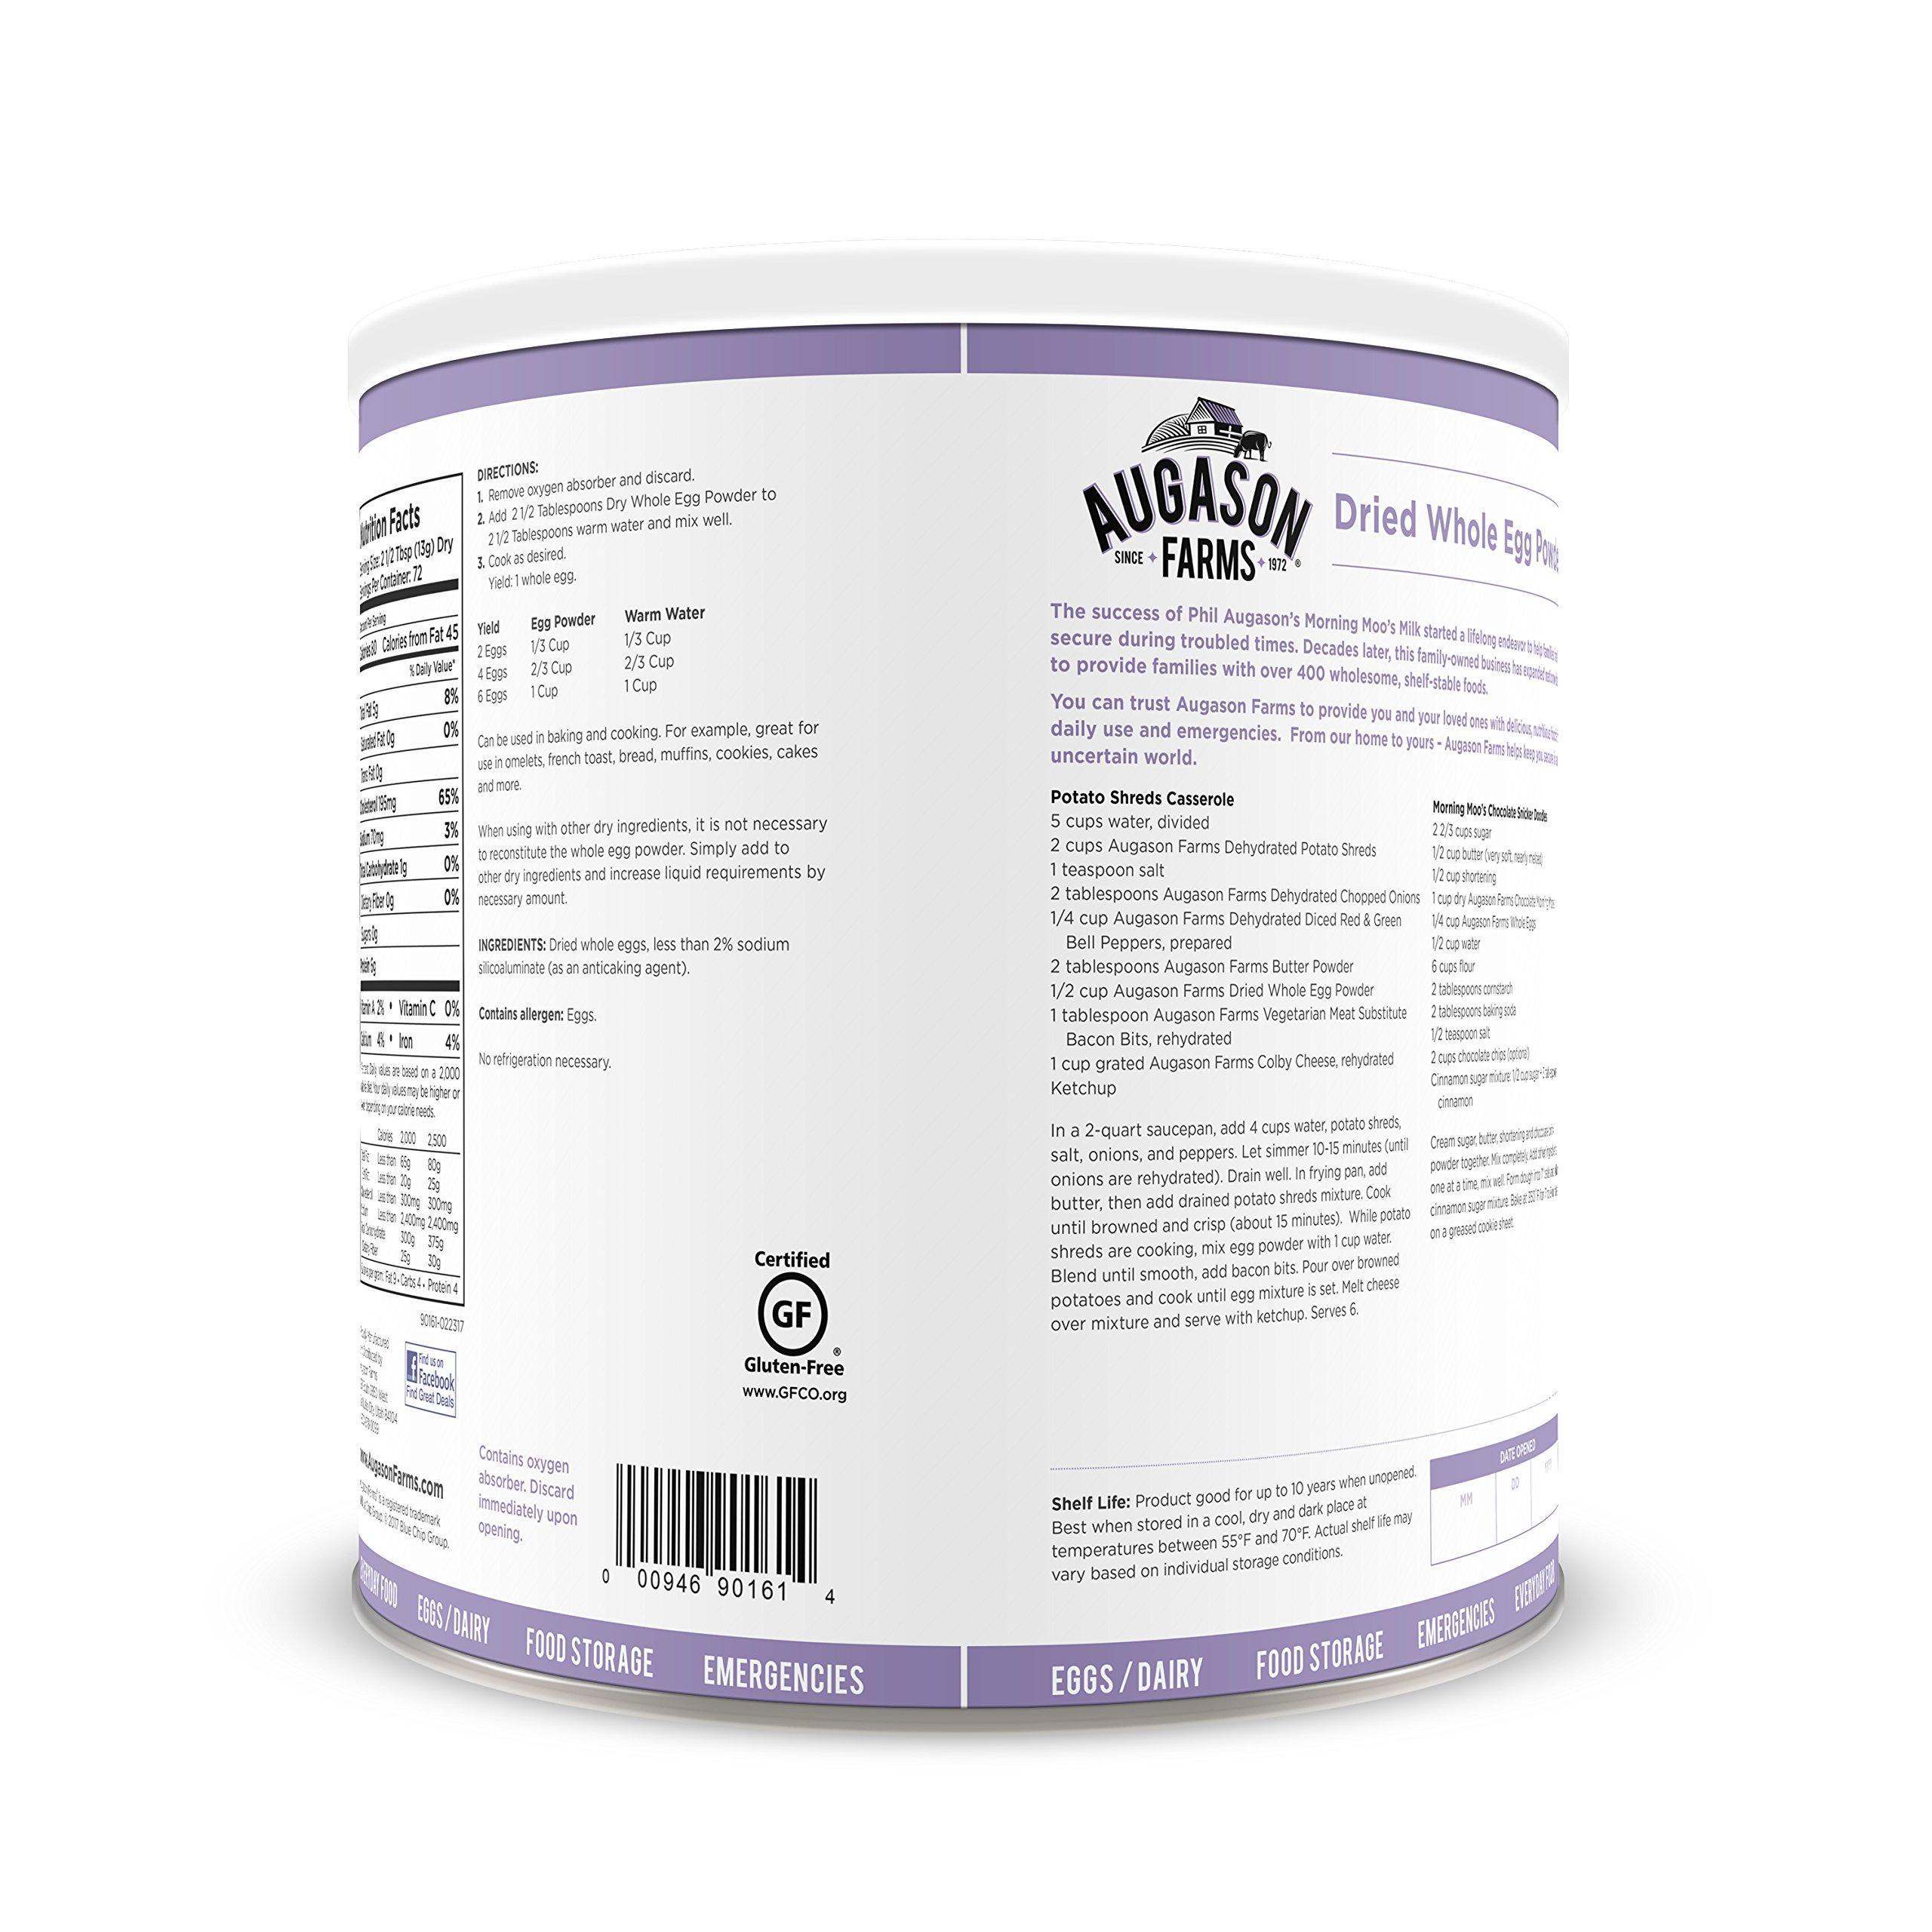 Augason Farms Dried Whole Egg Product 2 lbs 1 oz No. 10 Can by Augason Farms (Image #4)